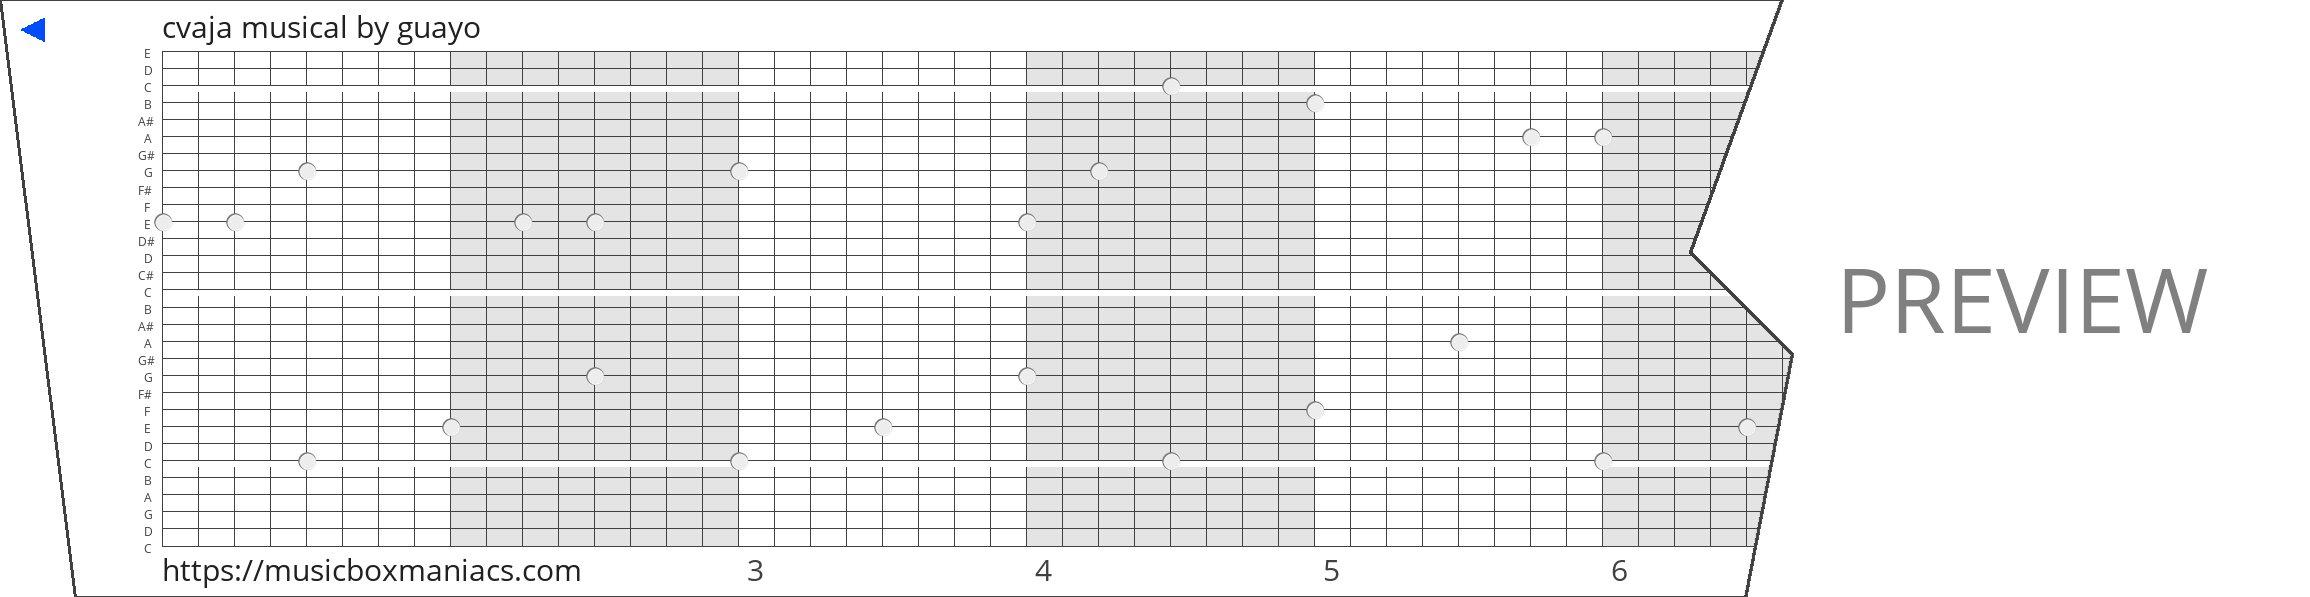 cvaja musical 30 note music box paper strip